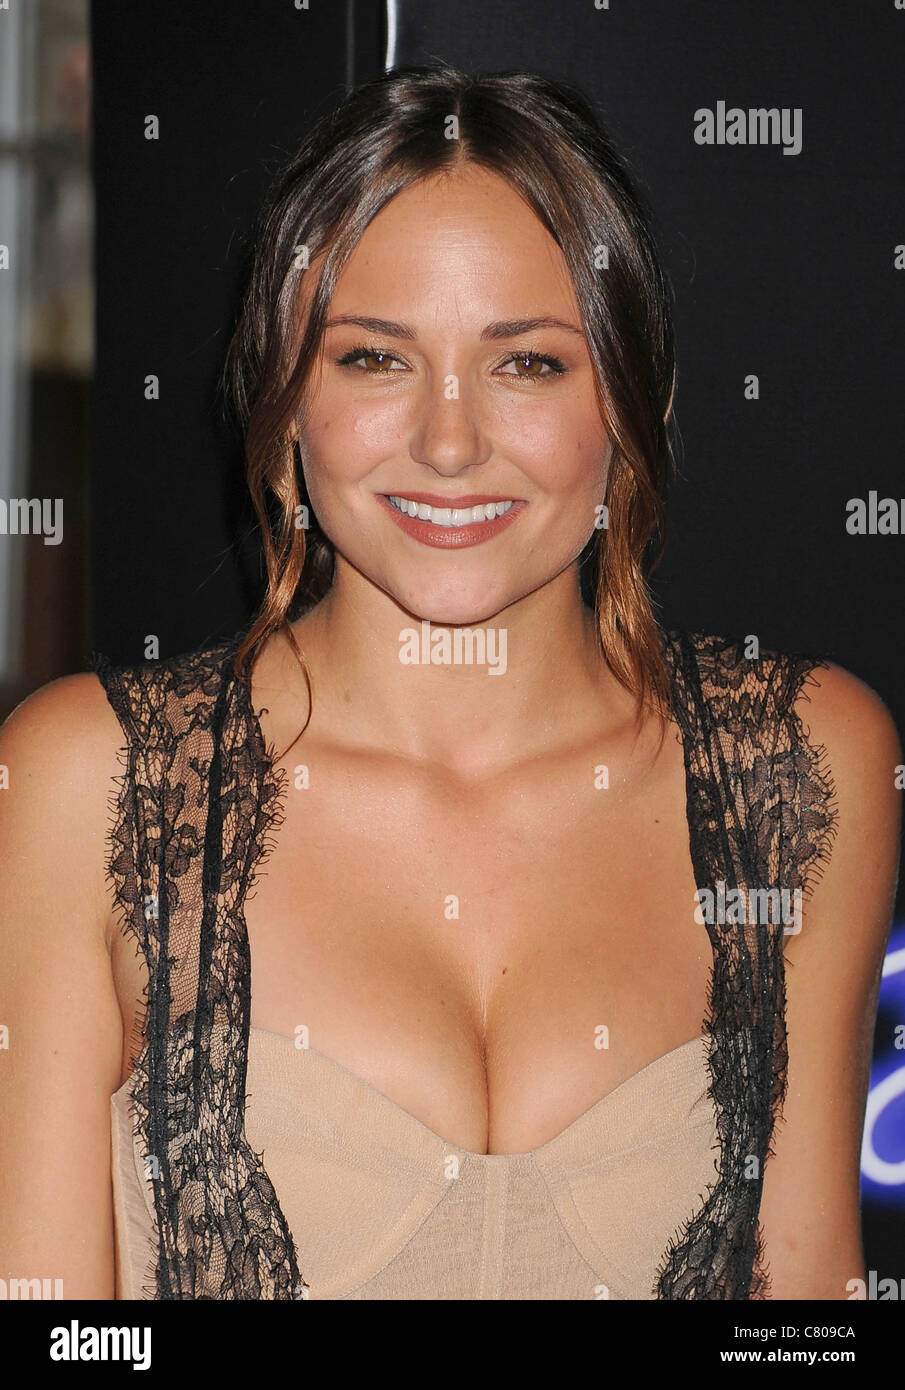 Bikini Briana Lee nudes (41 foto and video), Topless, Hot, Boobs, cleavage 2006